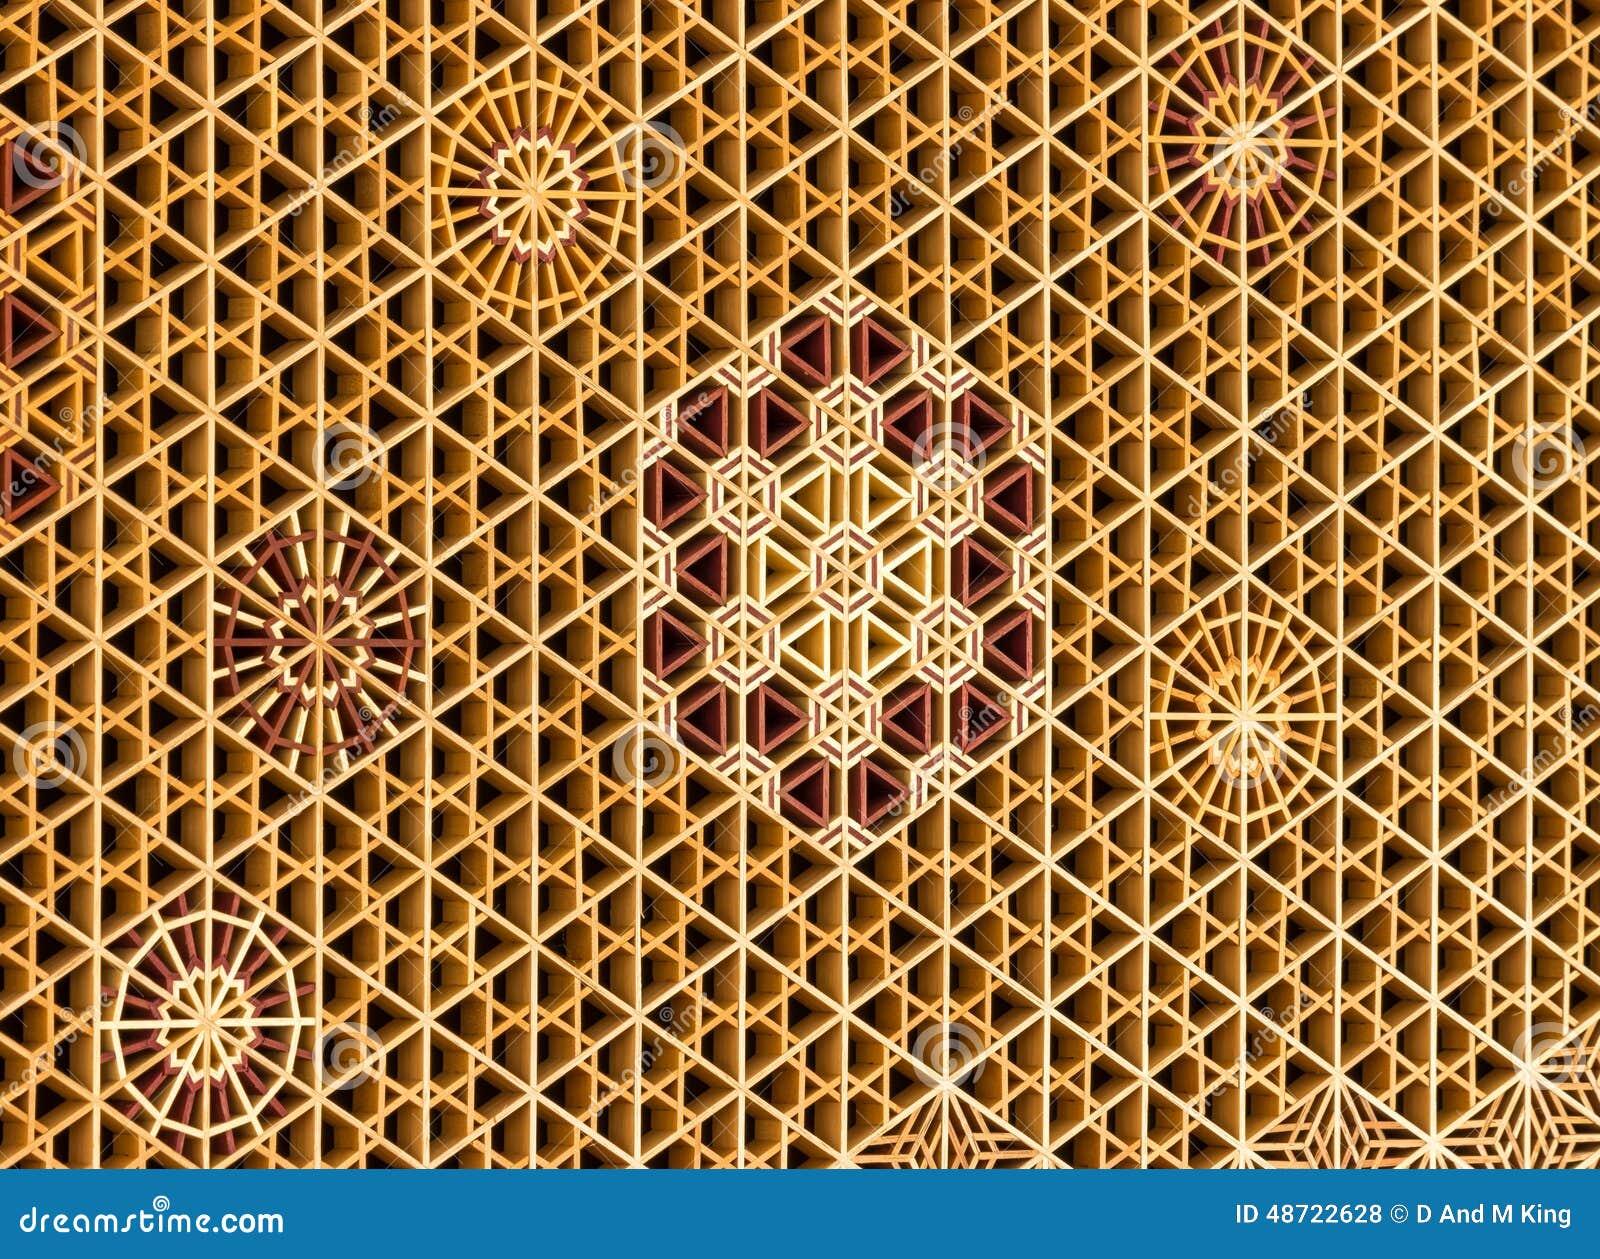 Shoji And Kumiko Pattern - Kaza-guruma Stock Photo - Image: 48722628